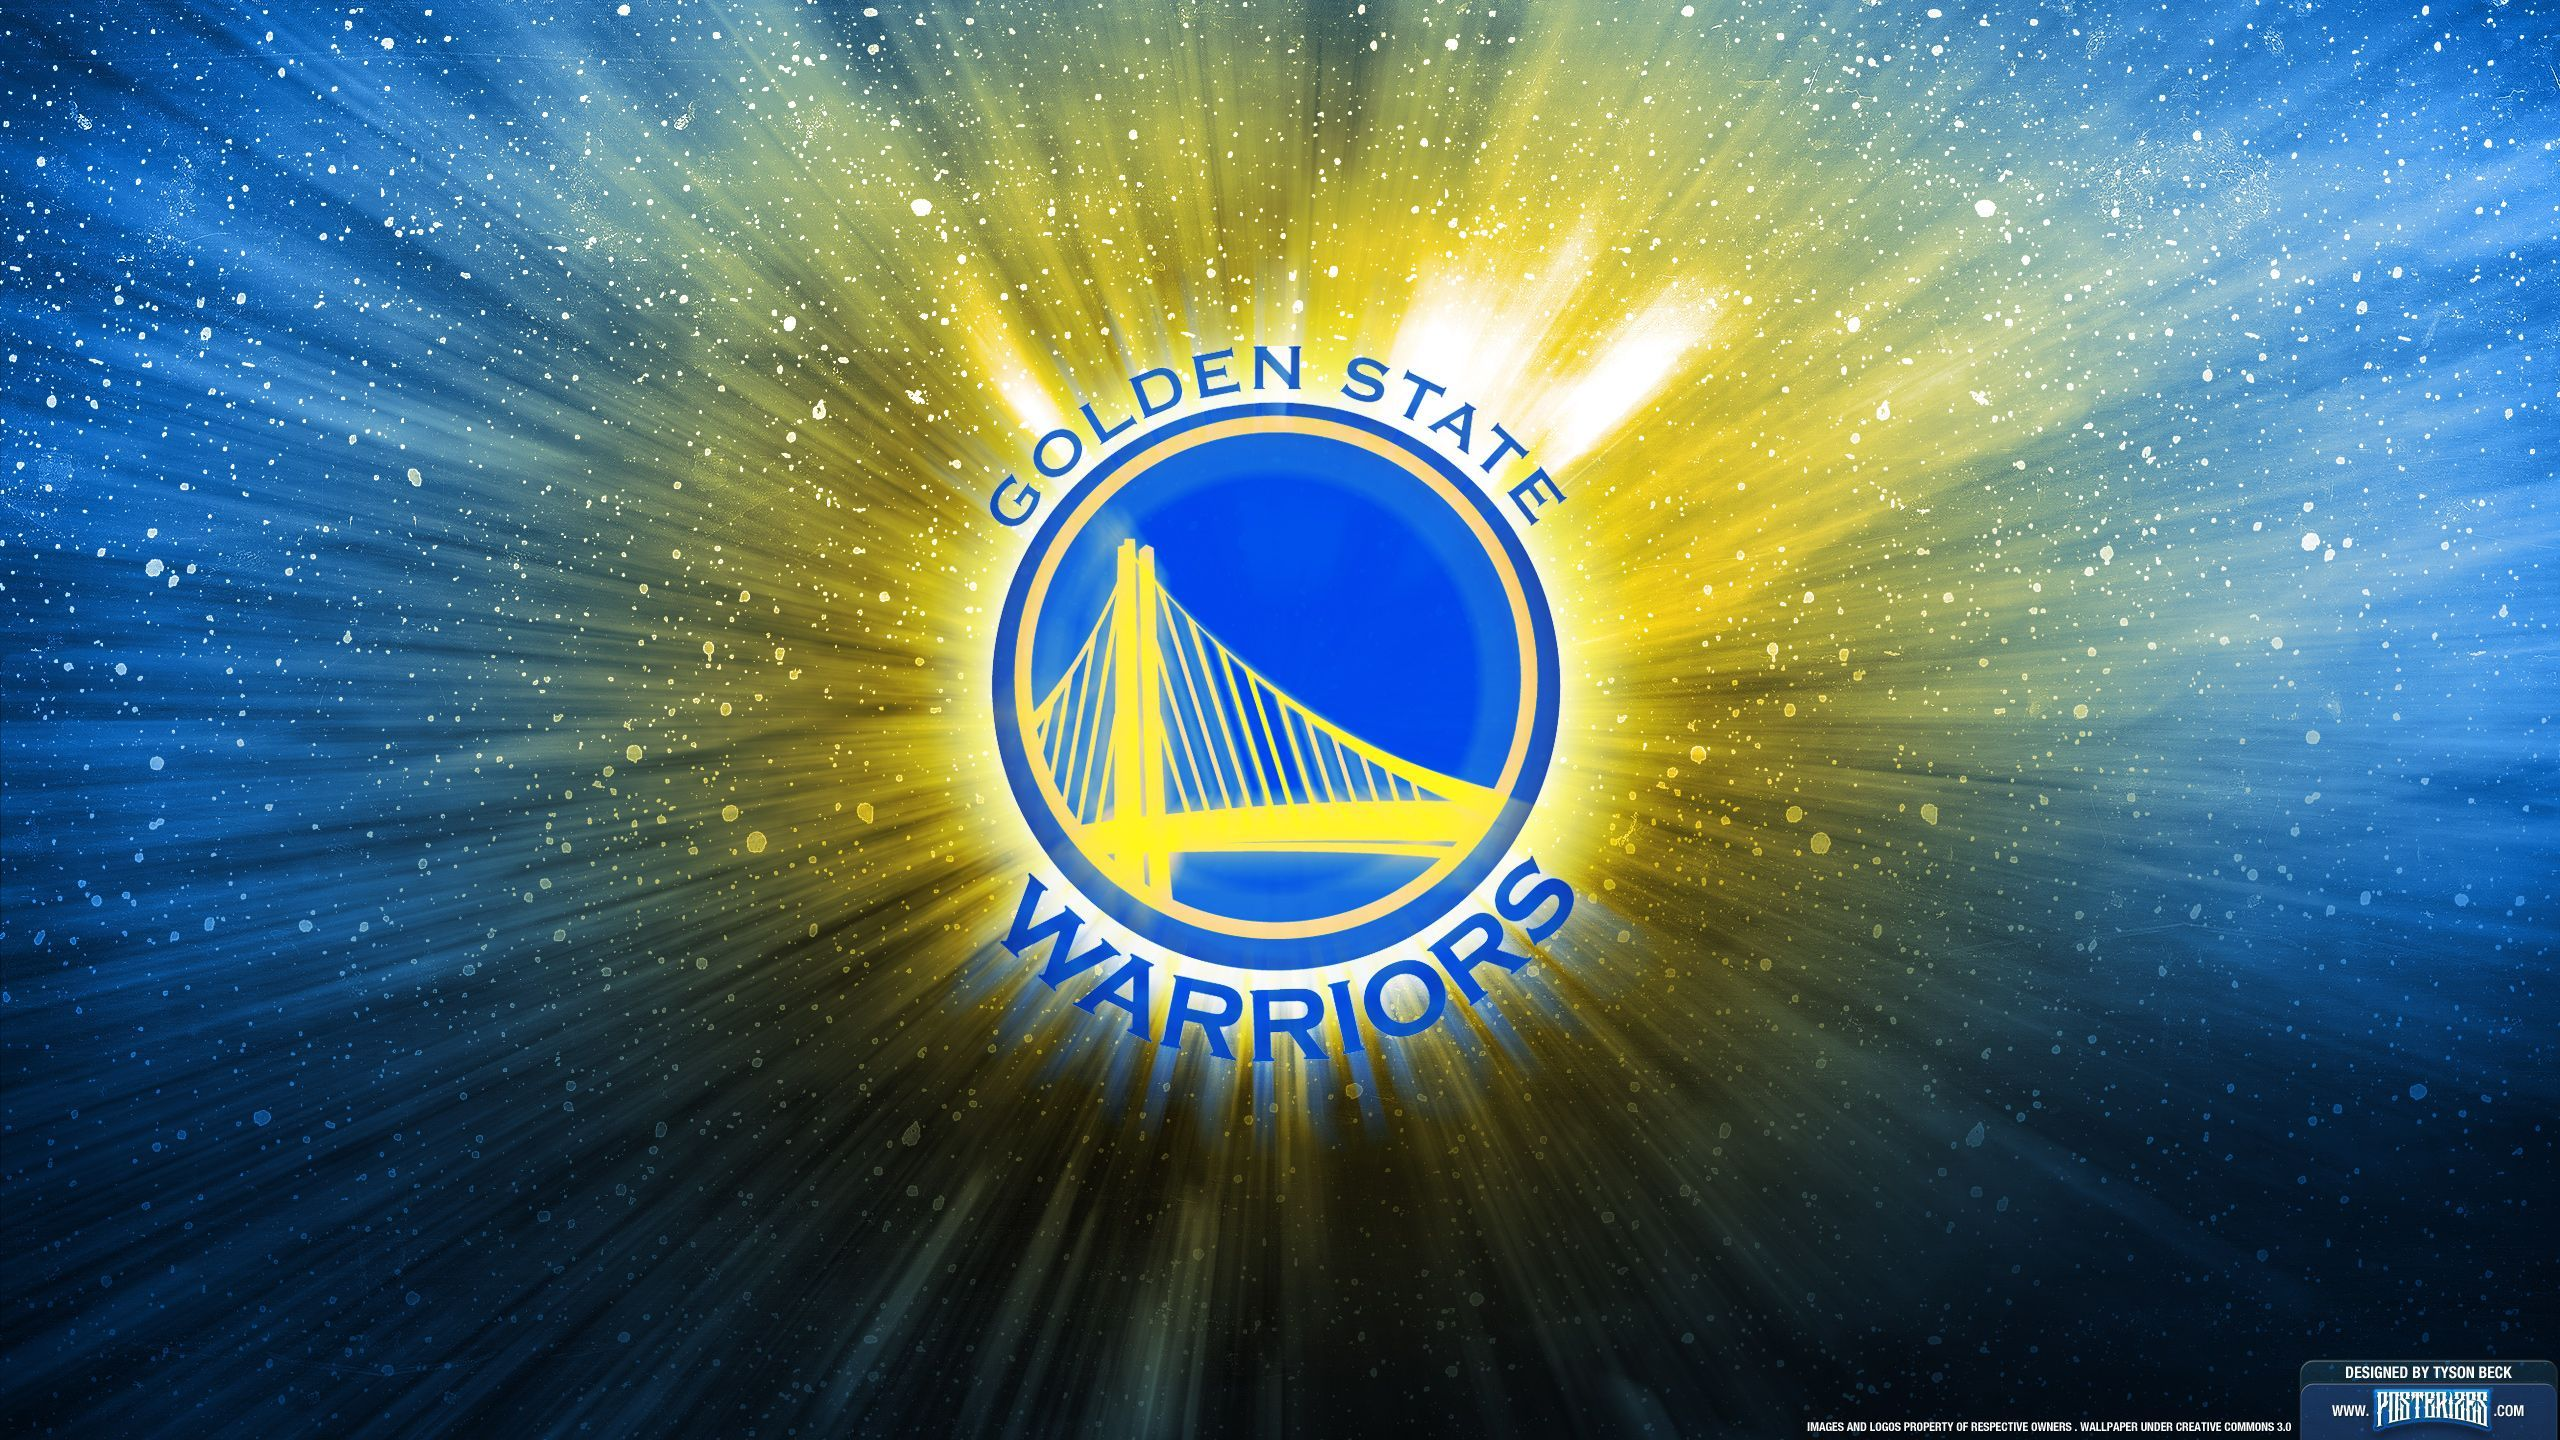 Top 20 Golden State Warriors Wallpaper - My Free Wallpapers Hub